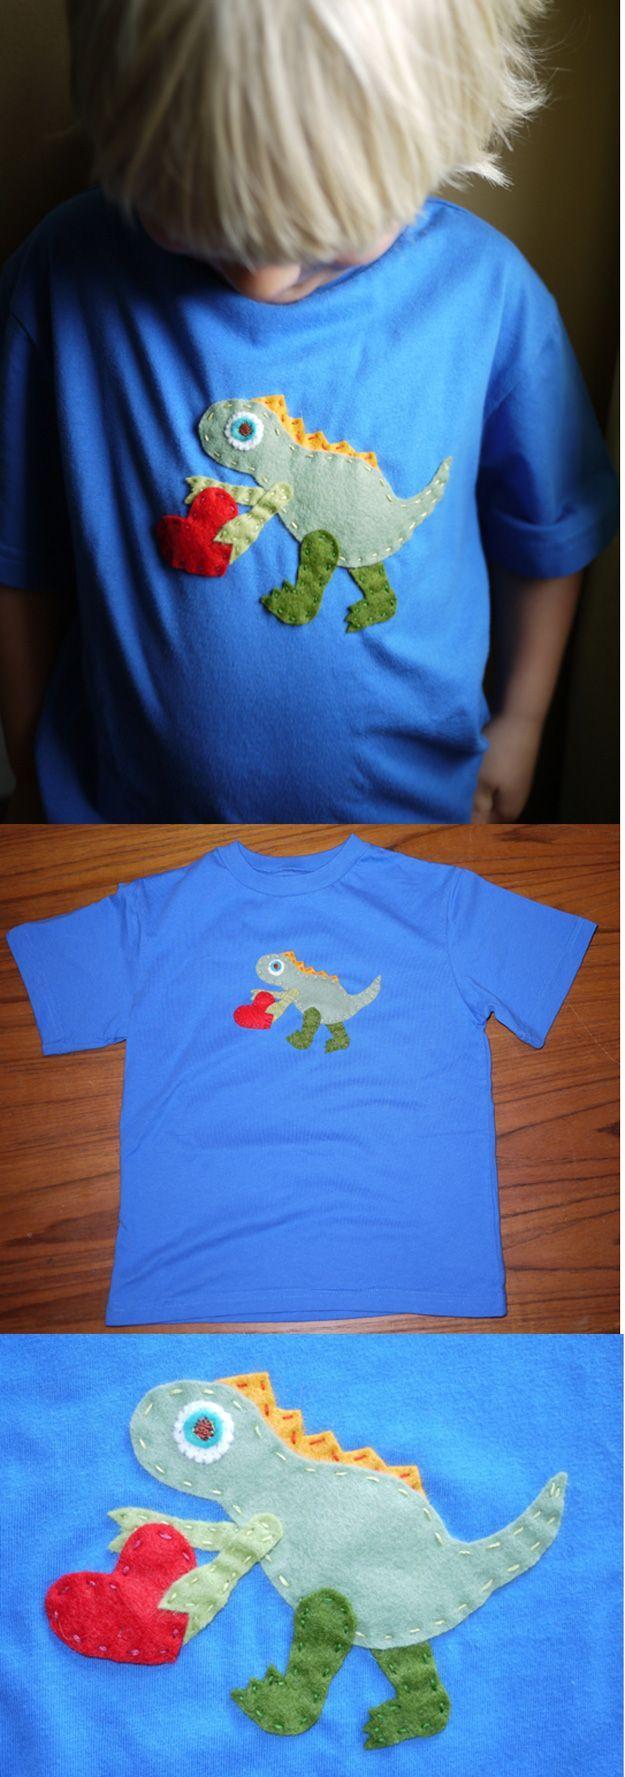 Easy Homemade Tshirt Craft for Boys | Dinosaur Shirt by DIY Ready at www.diyready.com/15-diy-clothes-for-kids-you-should-make/